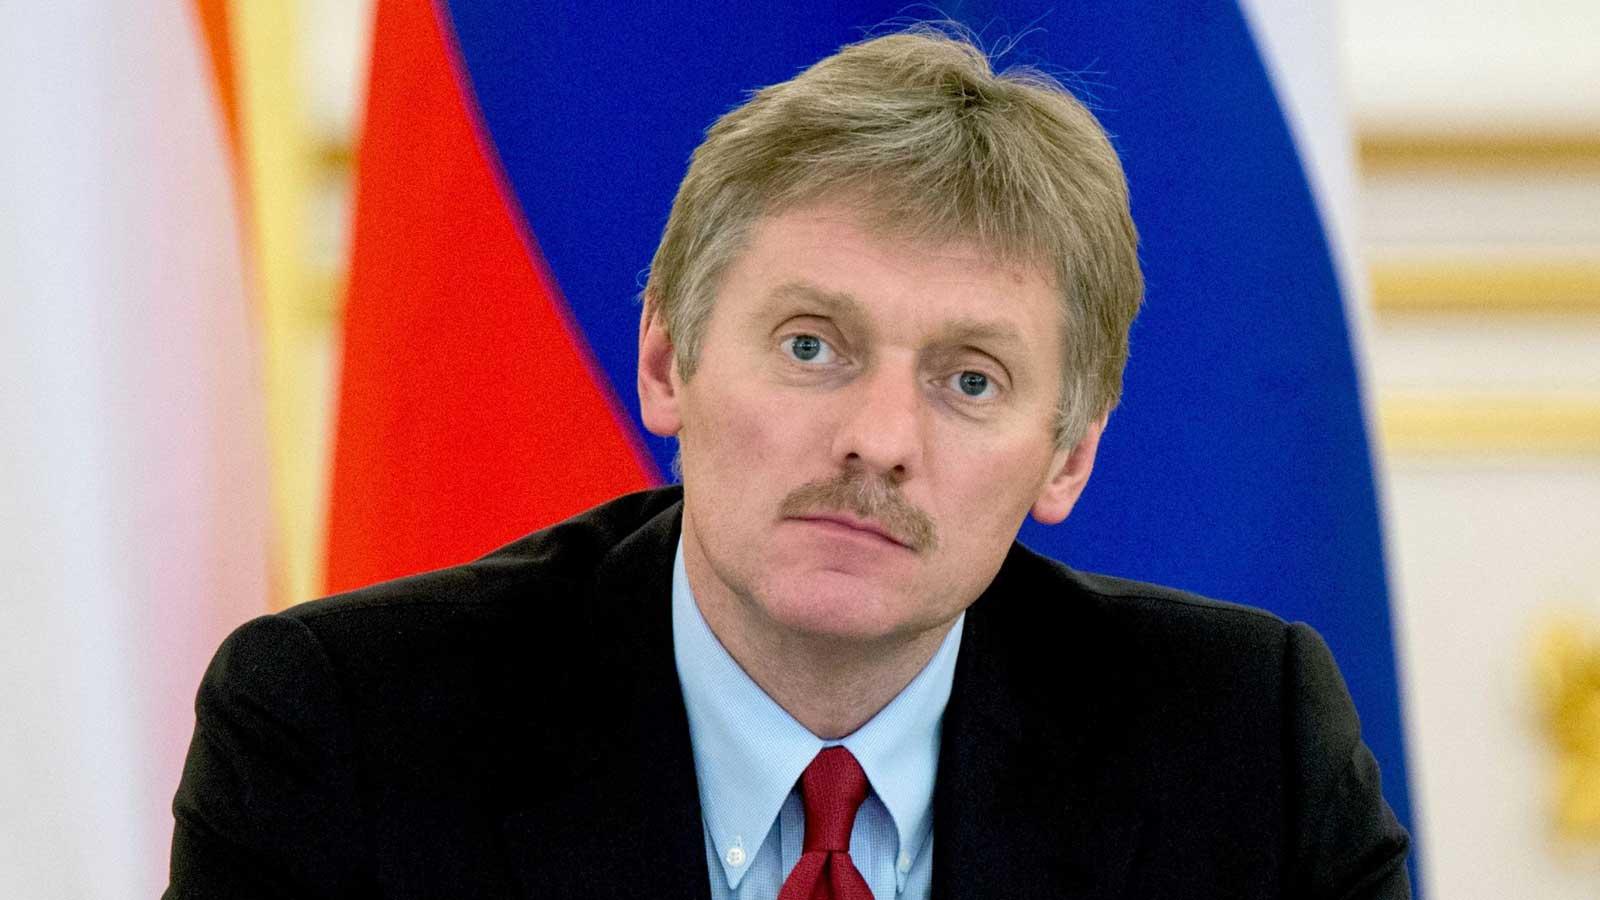 ПЦР-тест и самоизоляция Путина, визит в Москву Башара Асада. О чем говорил Песков